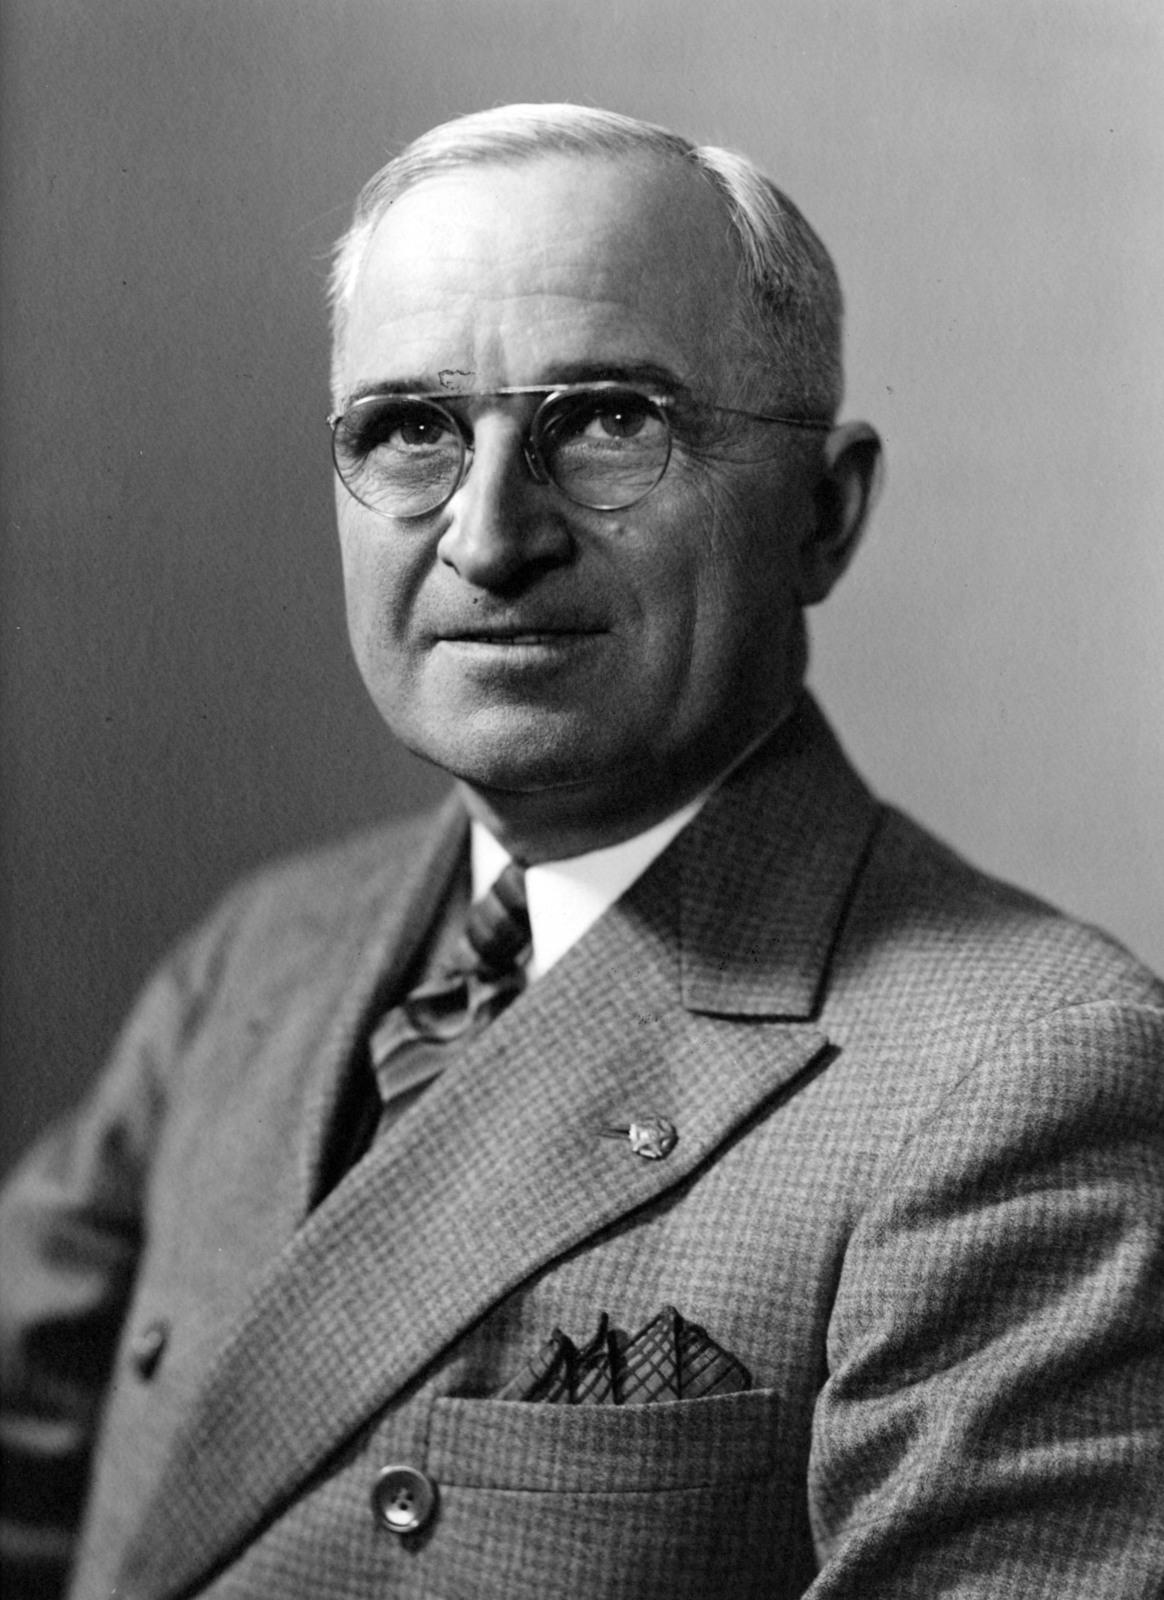 Head and Shoulders Portrait of Harry S. Truman